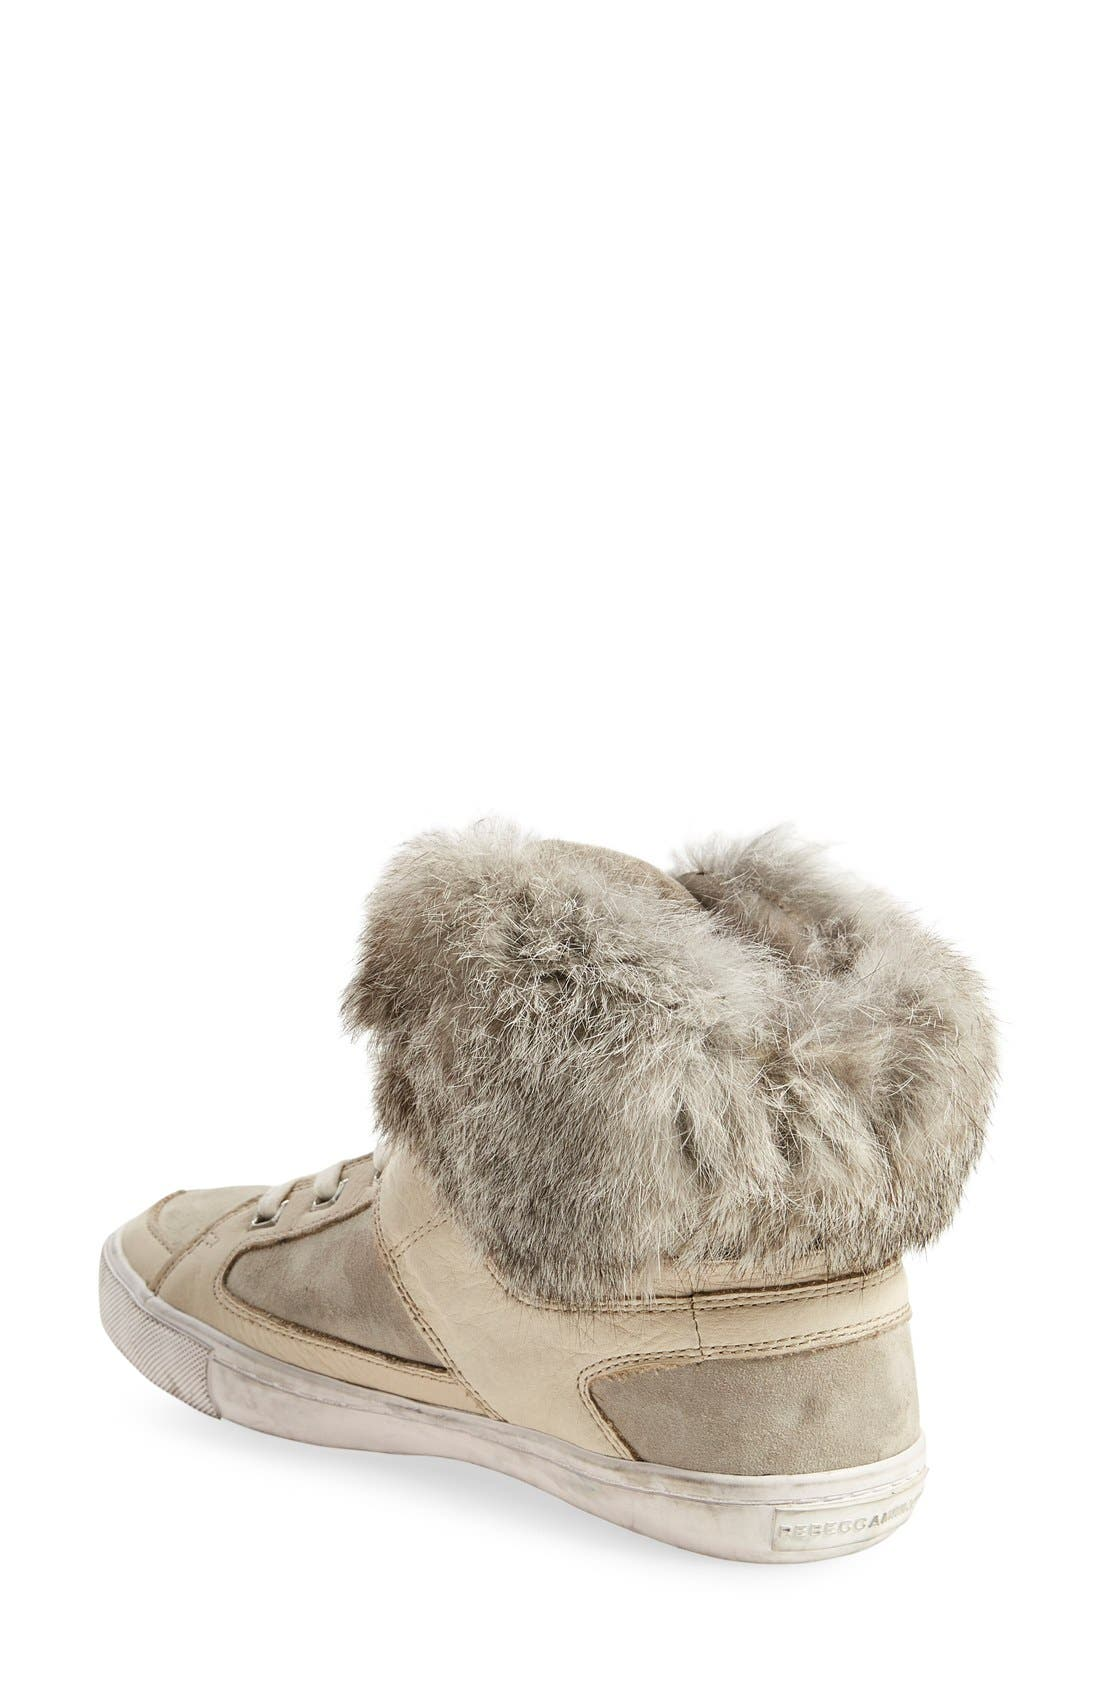 Alternate Image 2  - Rebecca Minkoff'Shiloh' Genuine Rabbit Fur CollarSneaker (Women)